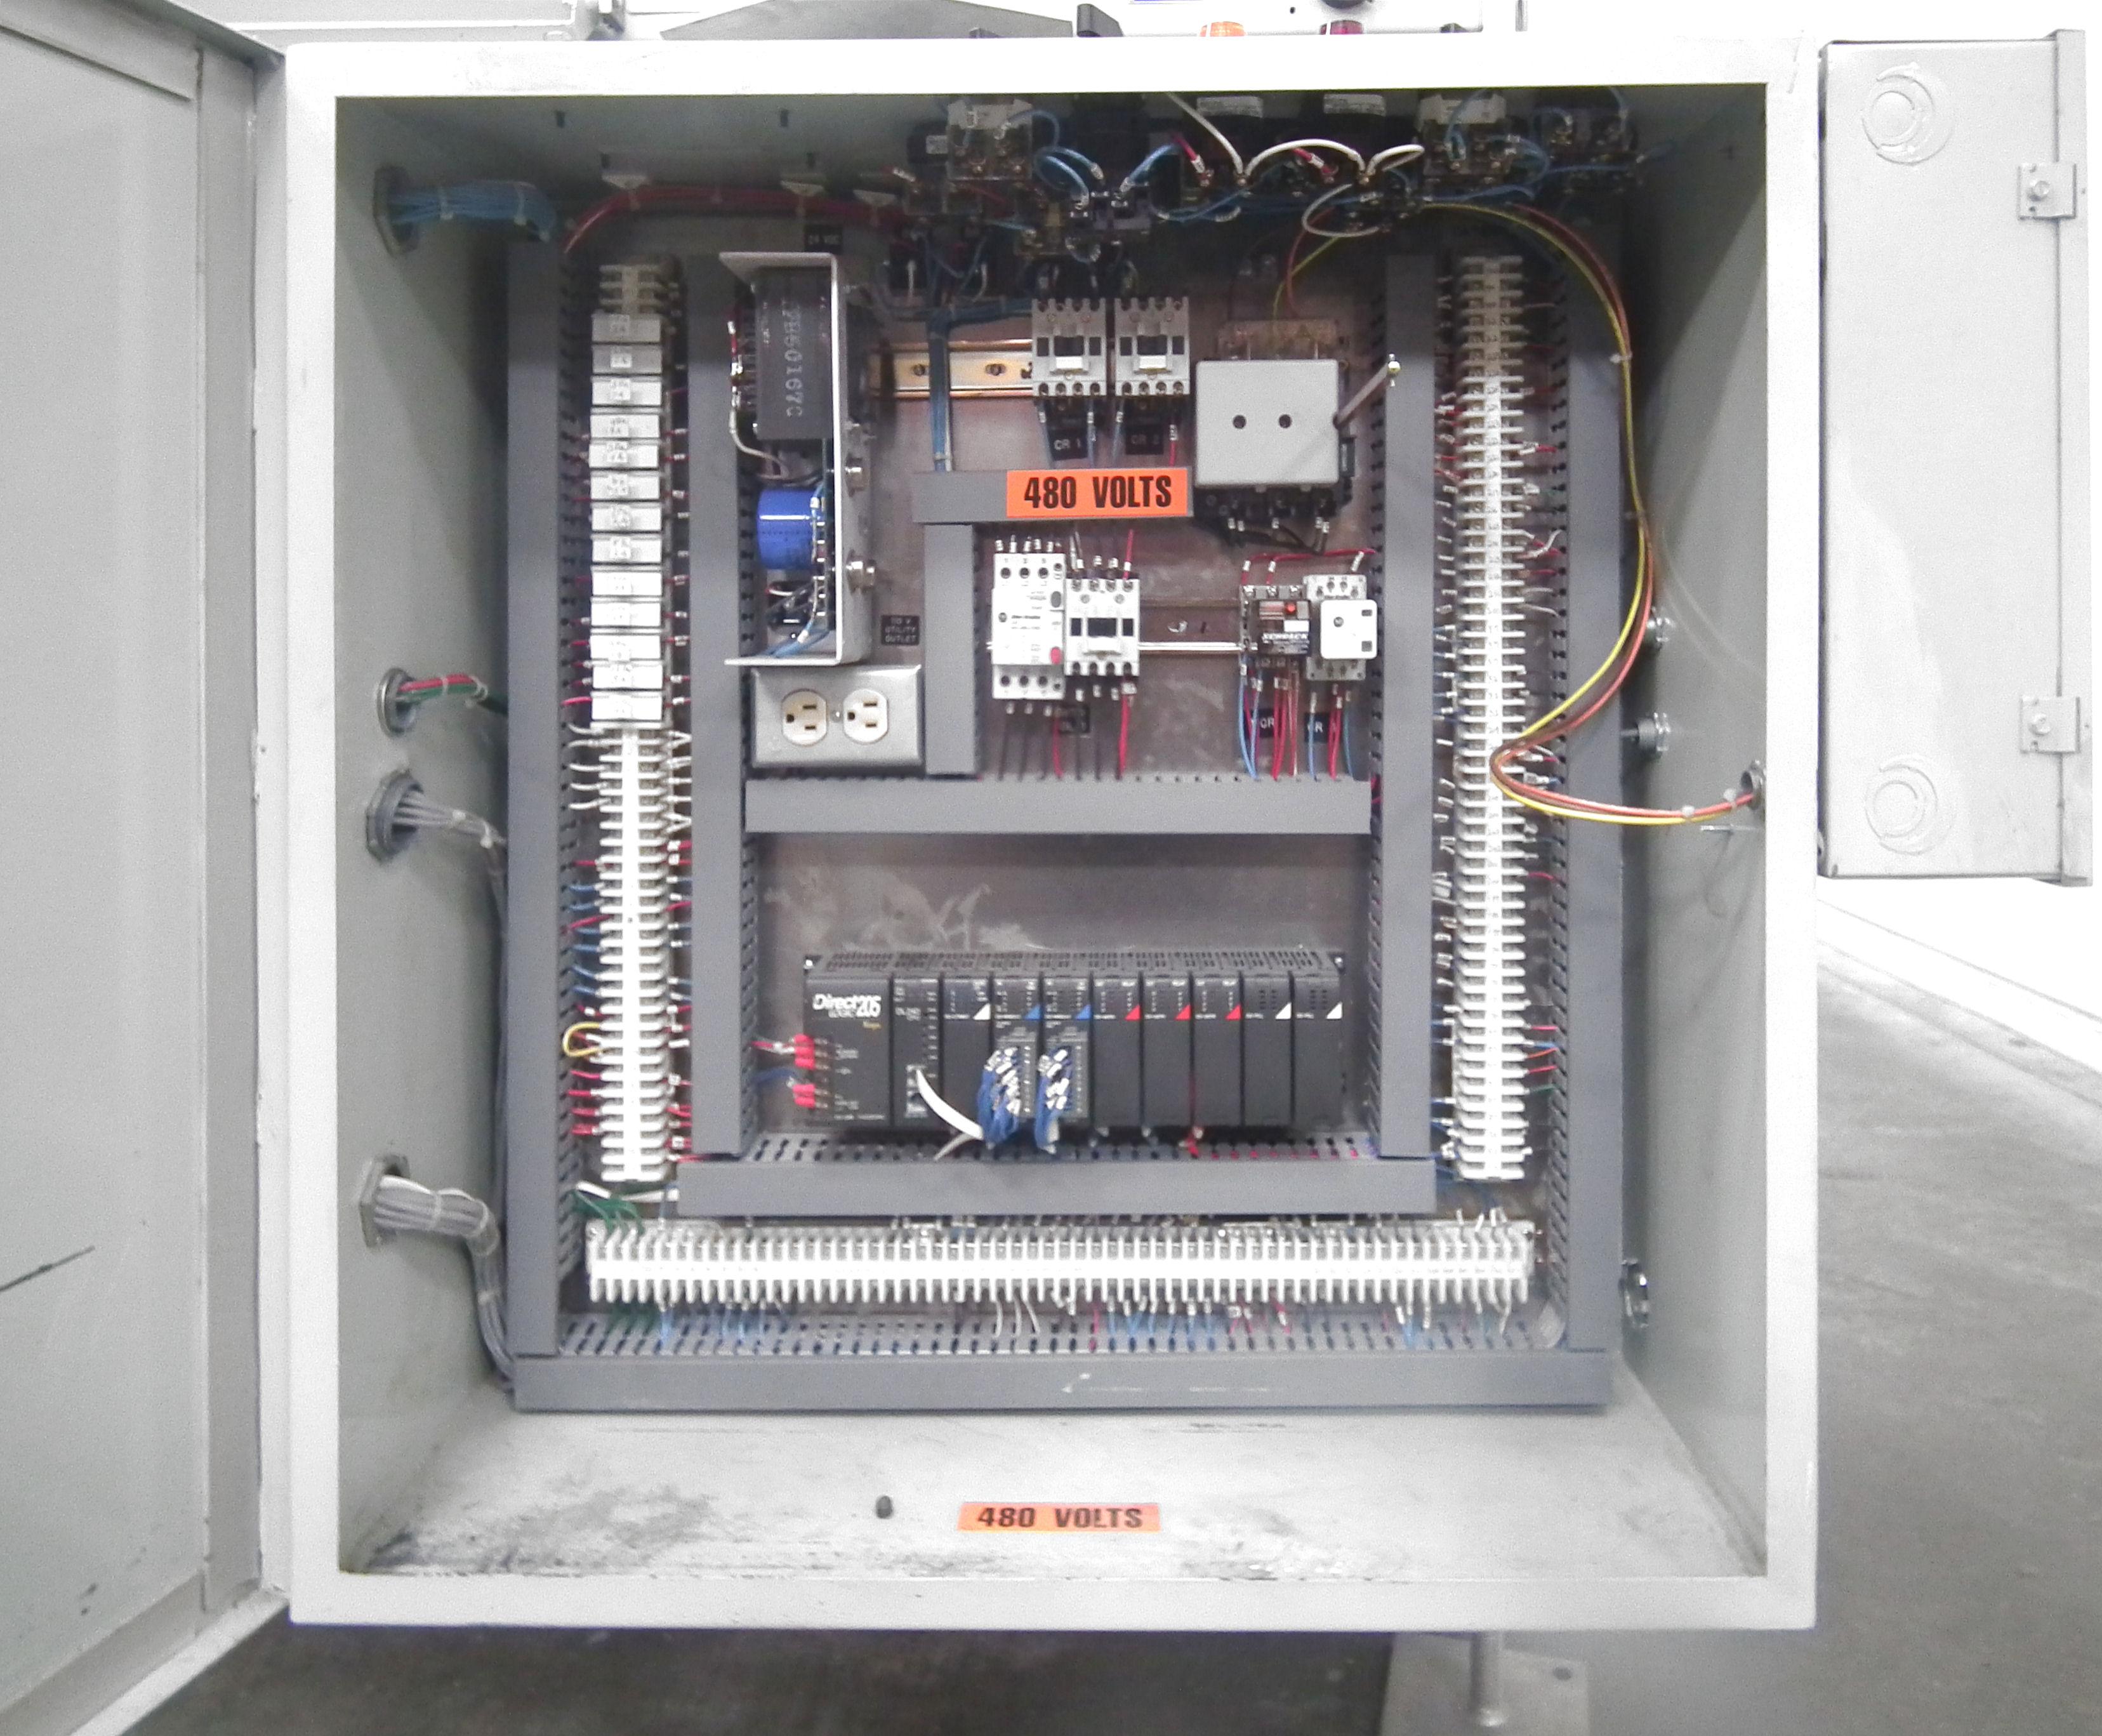 Marq Tuff HPE-NS-MF/RH/DL Bottom Tape Case Erector A9697 - Image 15 of 15